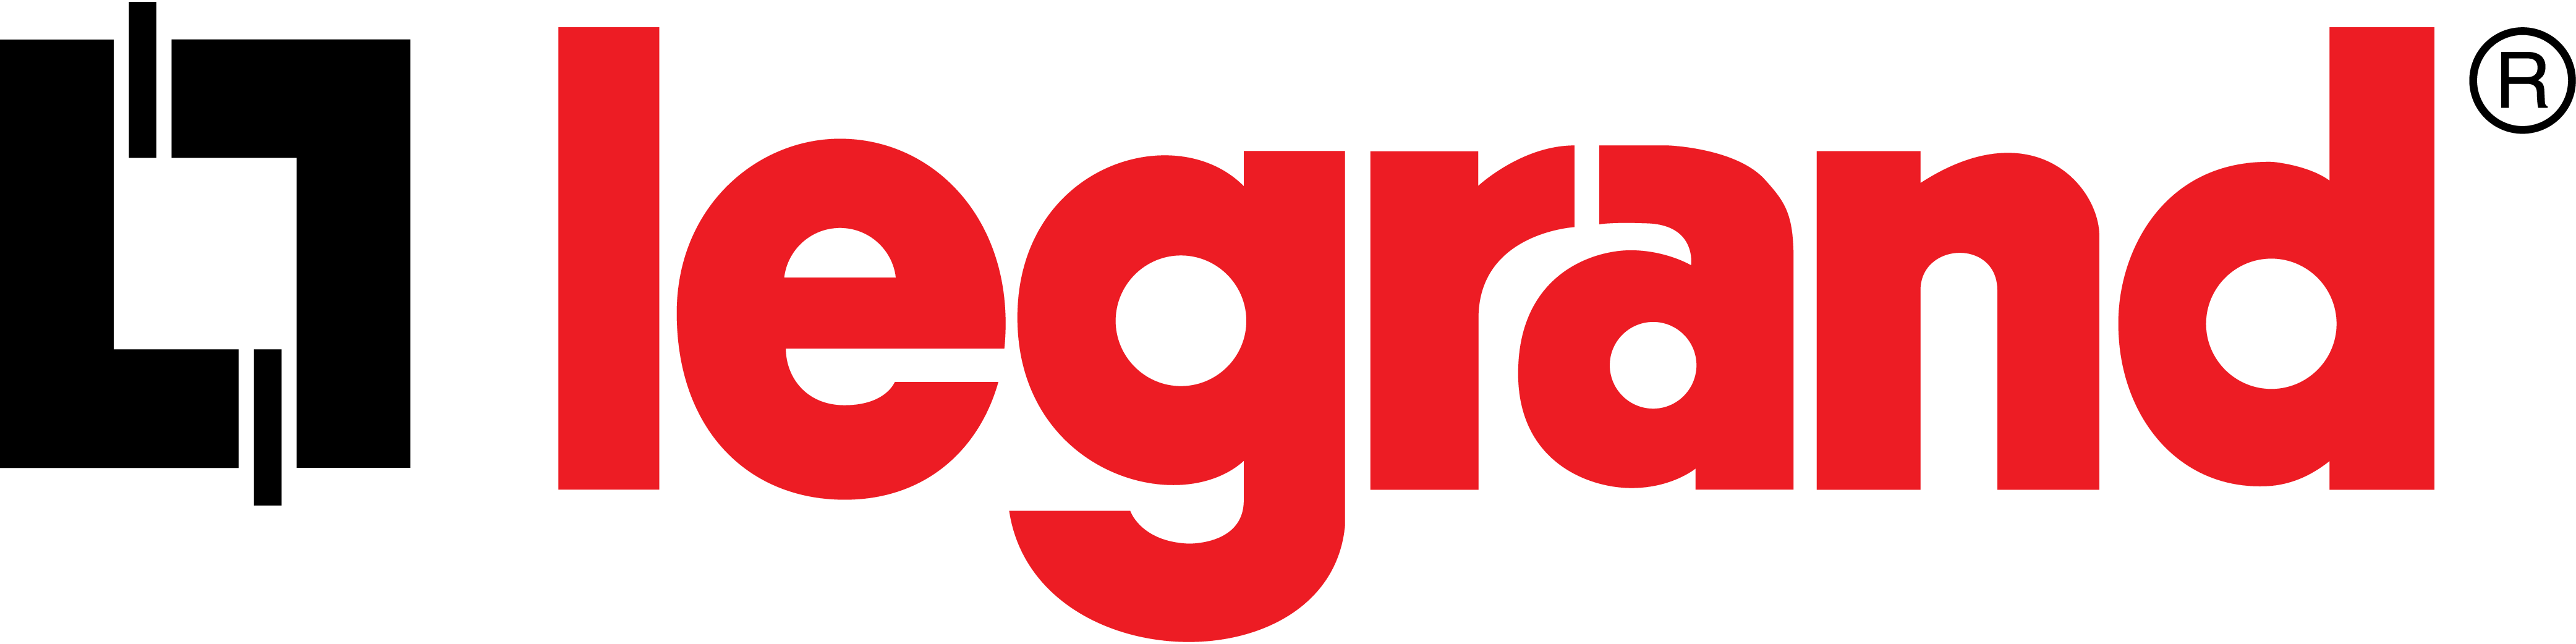 brand_legrand